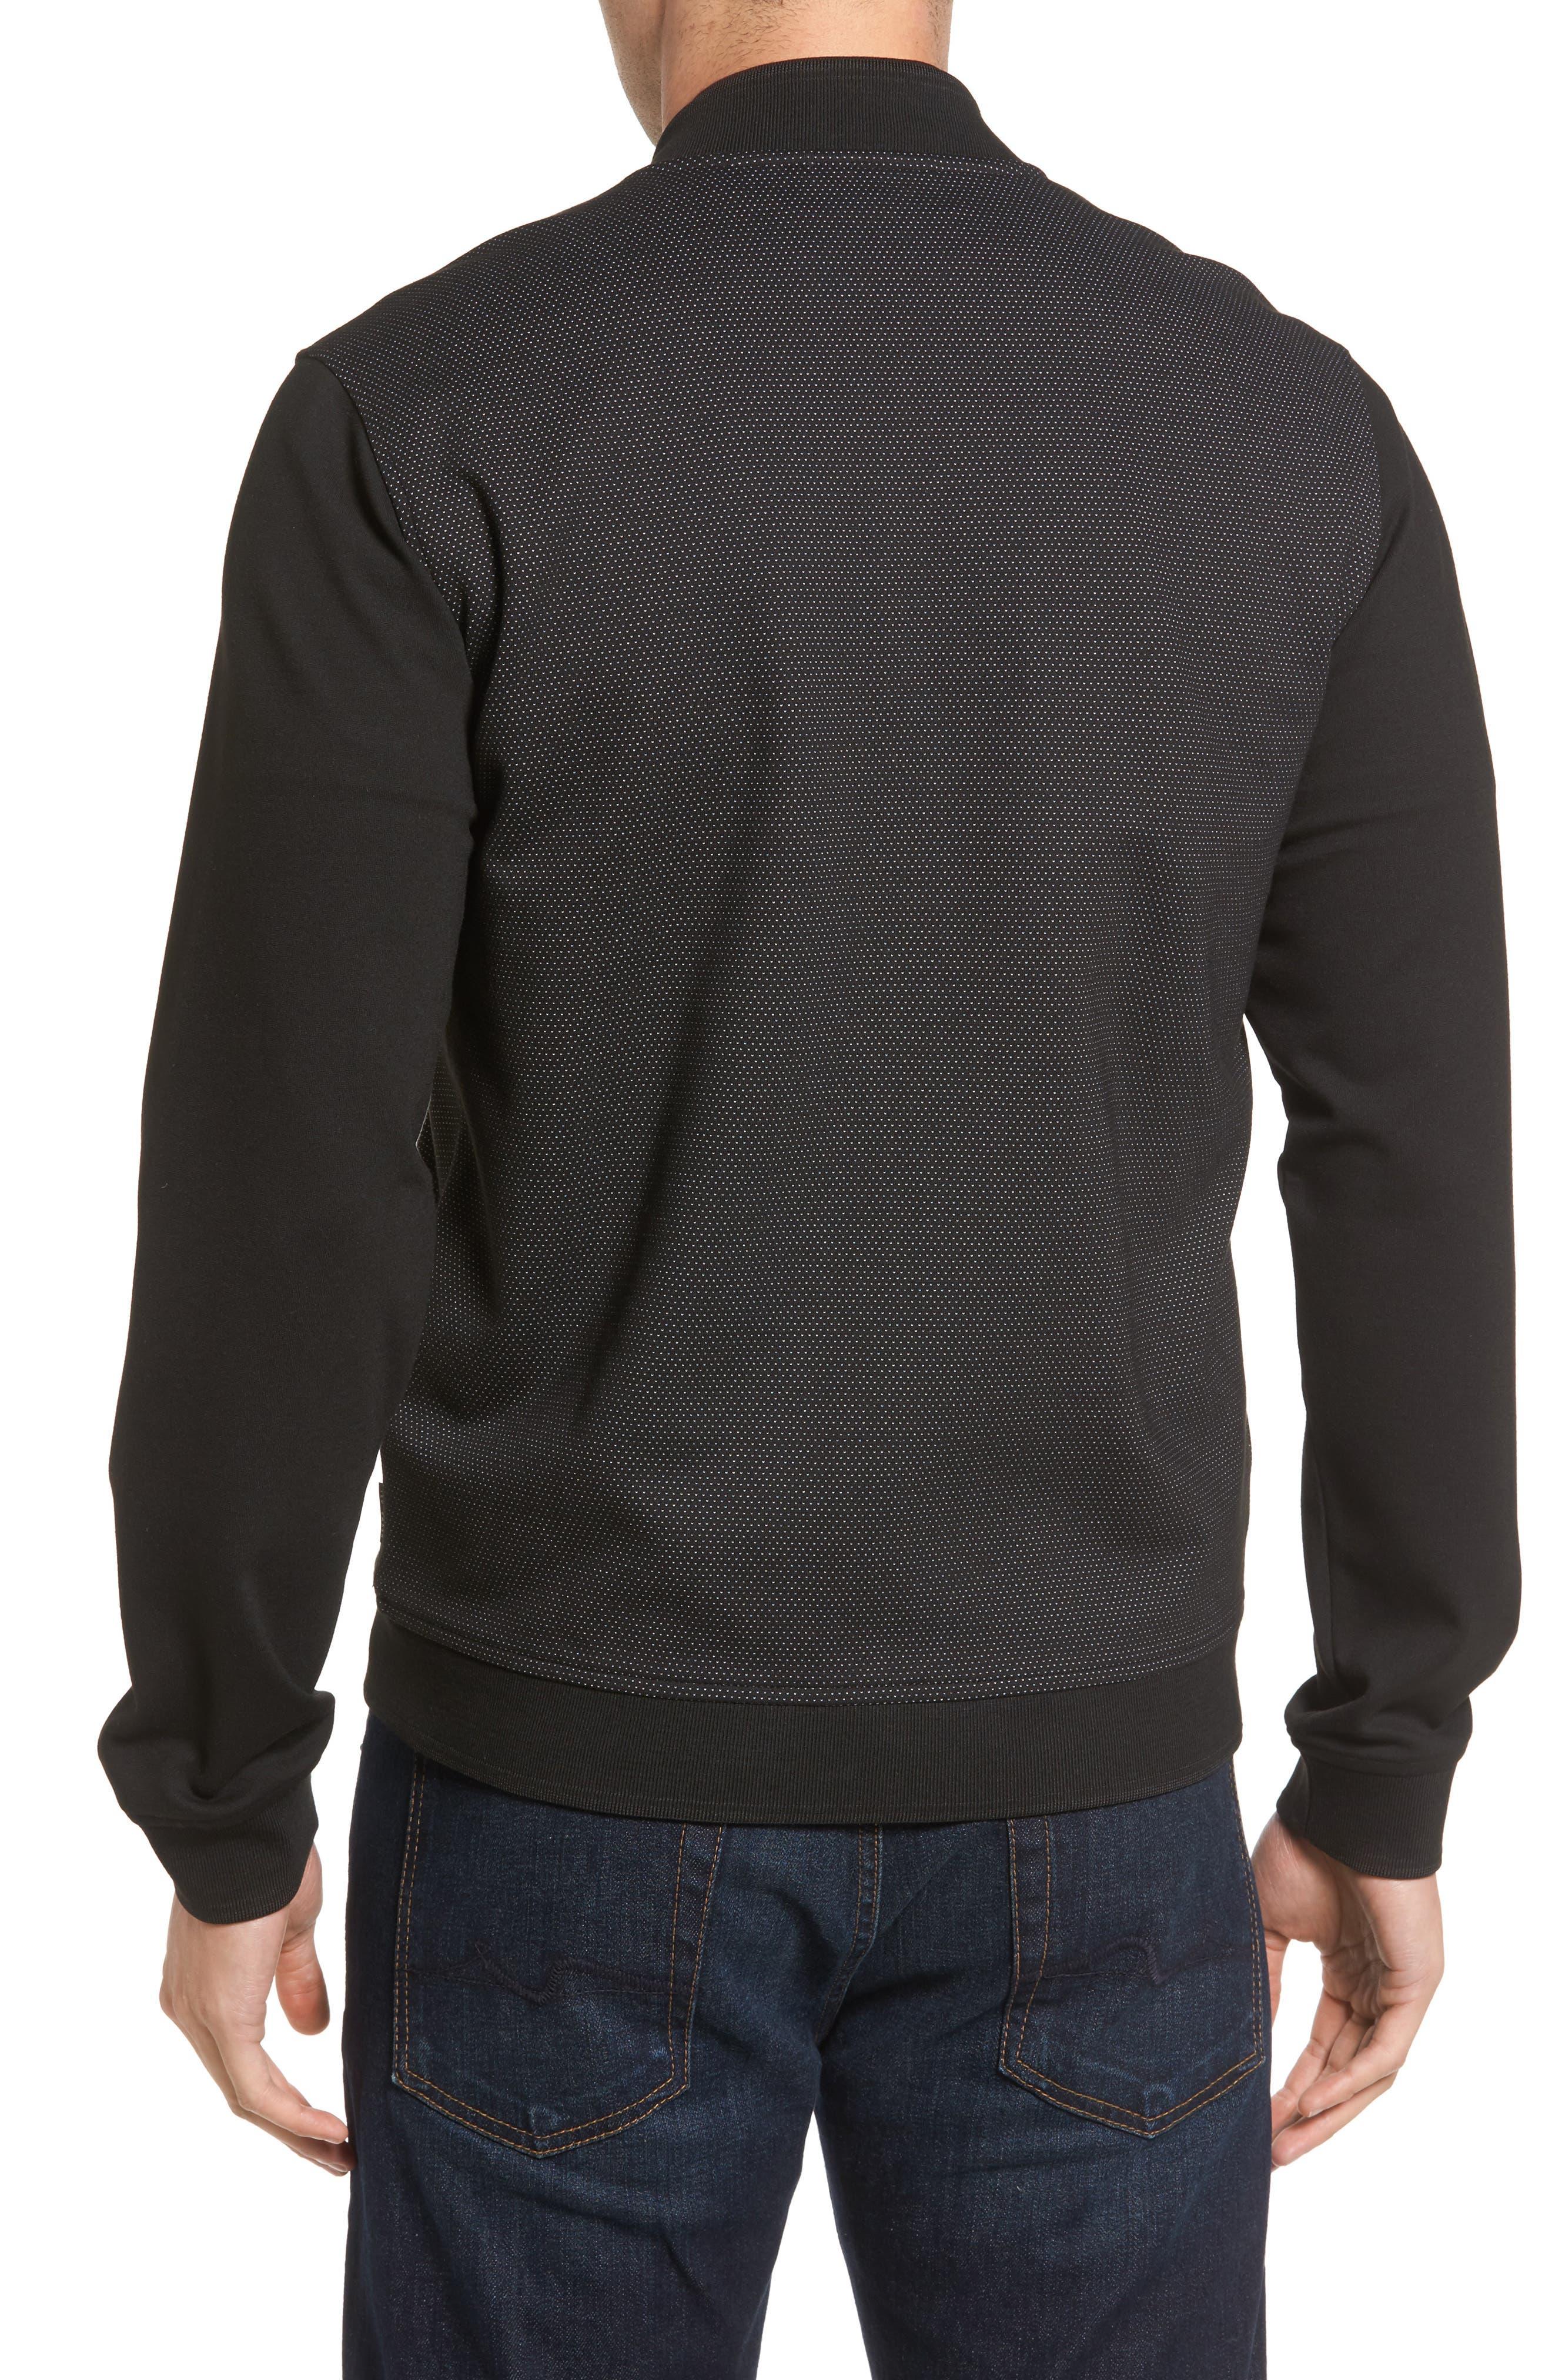 Badford Baseball Jacket,                             Alternate thumbnail 2, color,                             Black